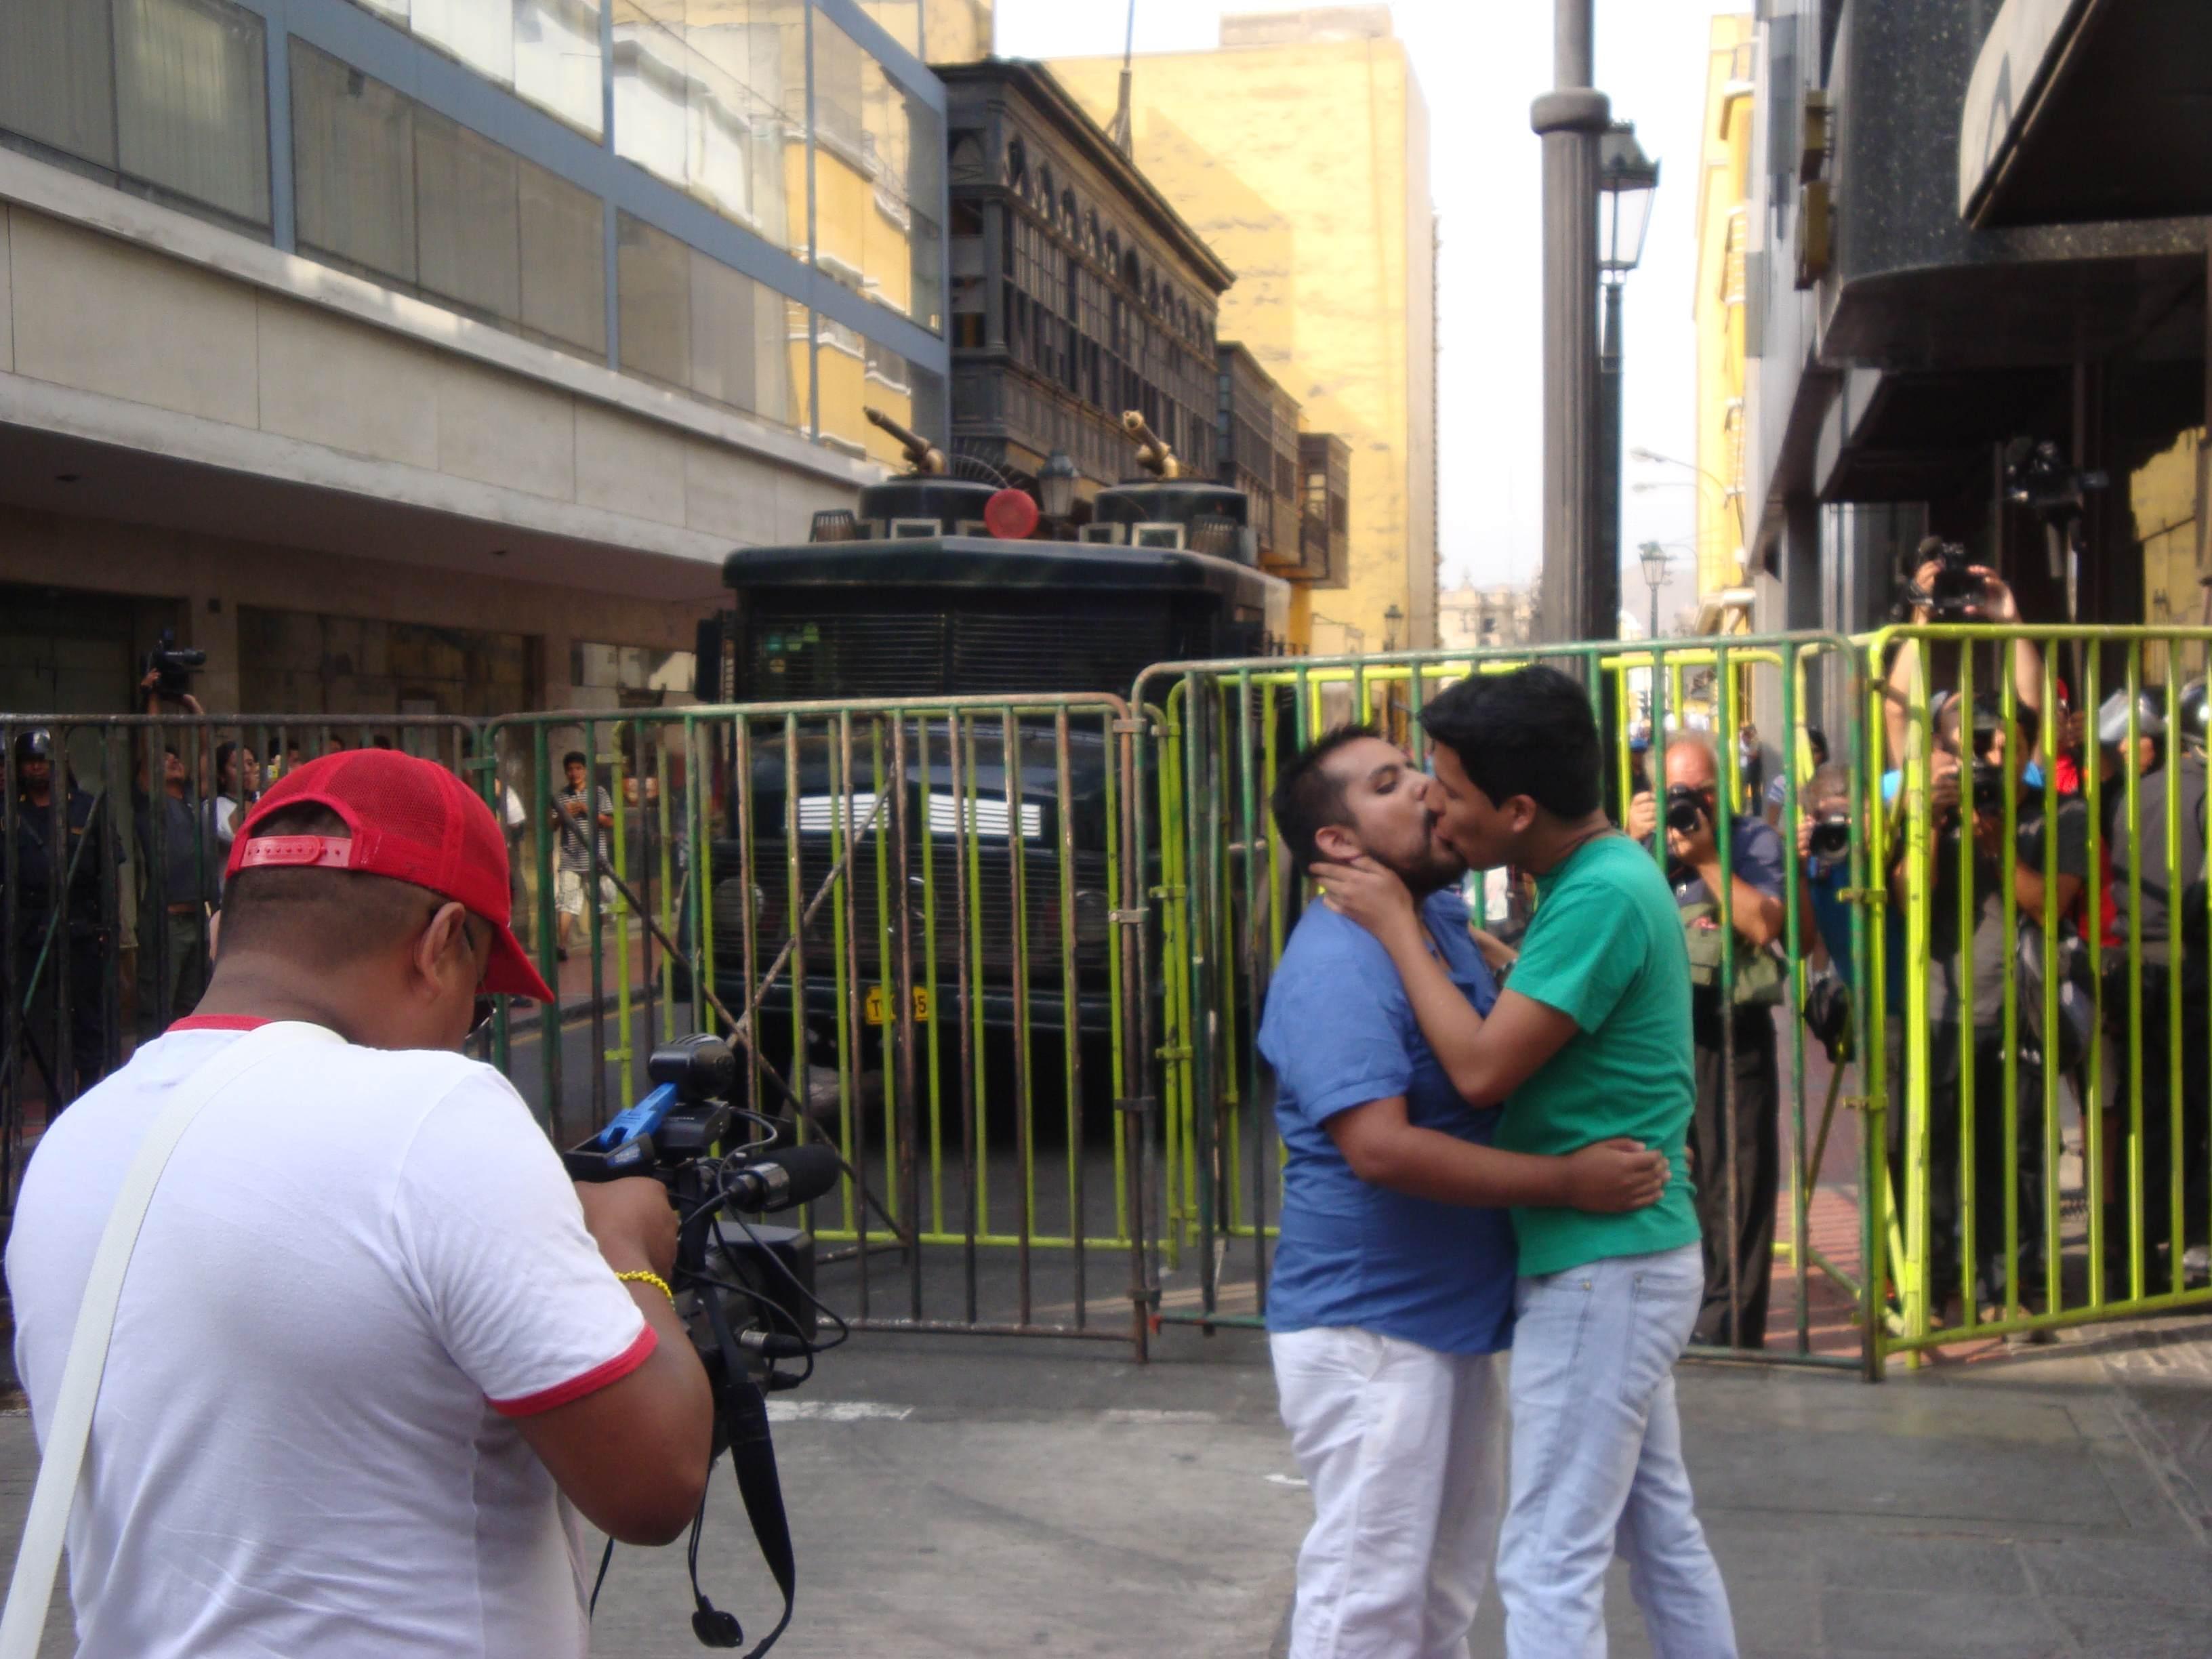 besos gay putas peruanas videos gratis